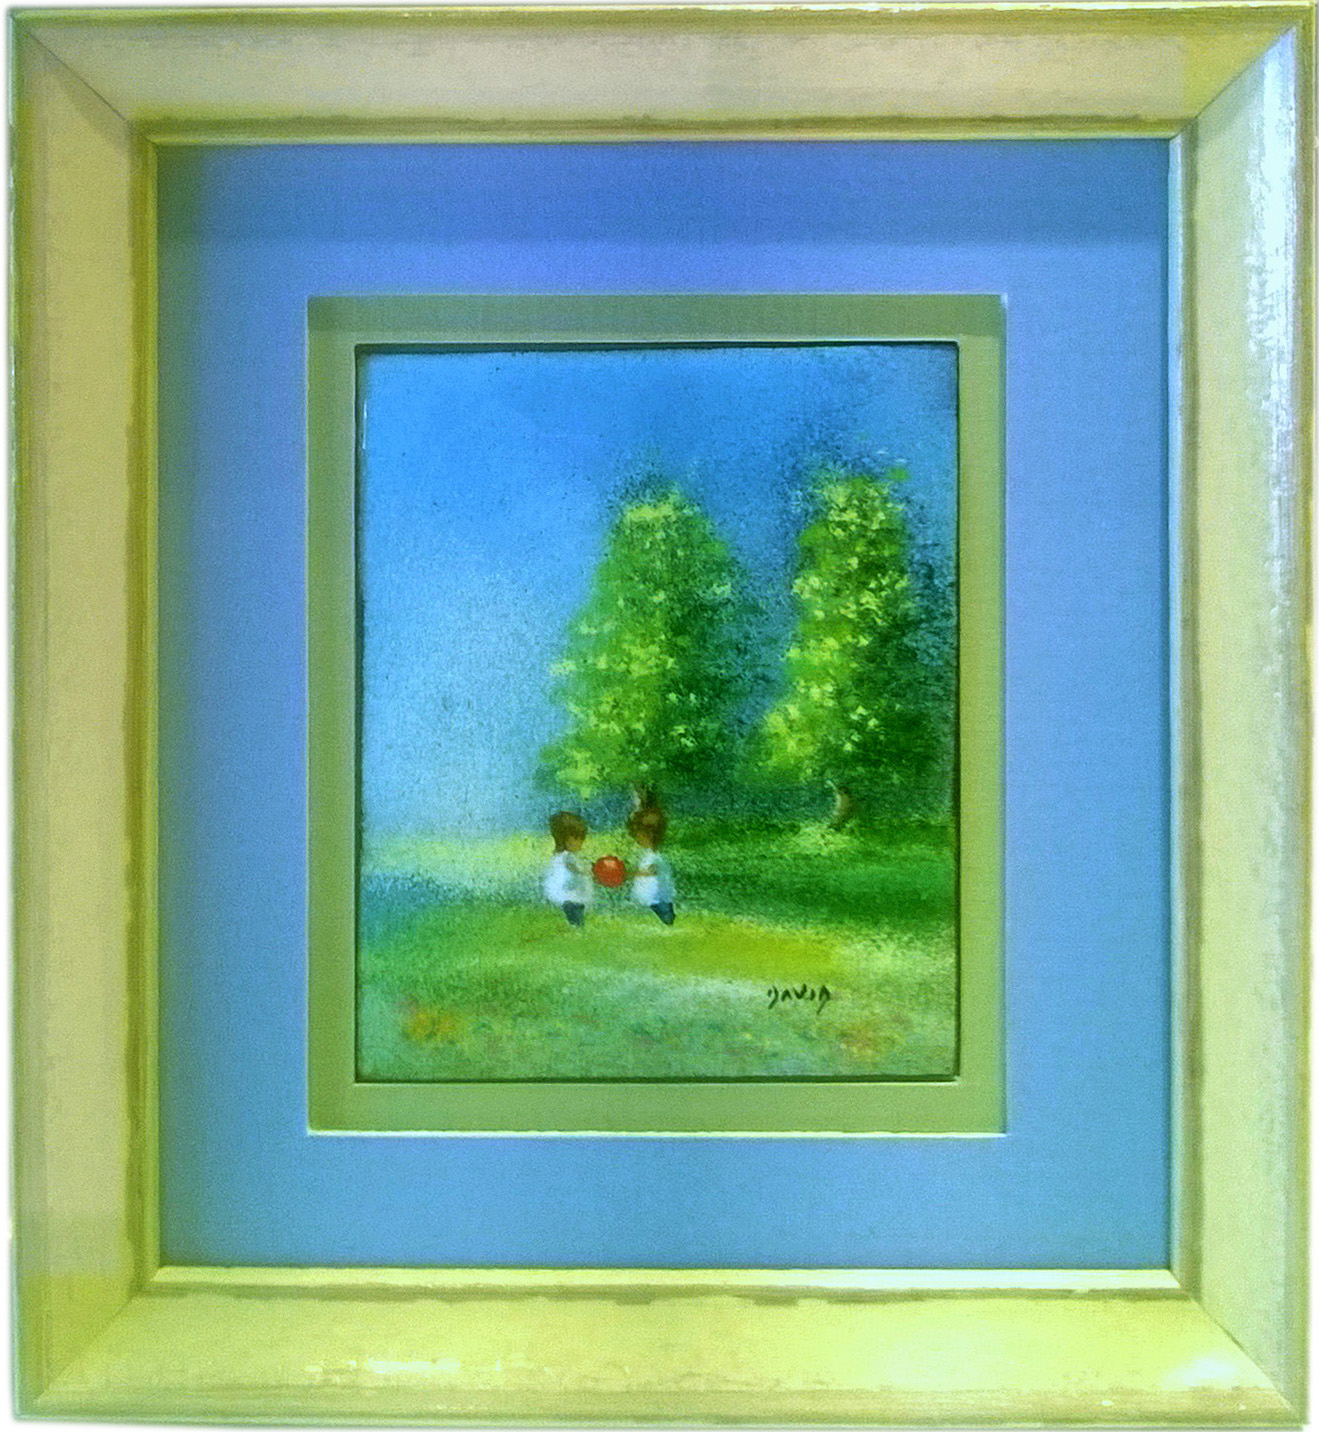 Mini painting custom picture frame